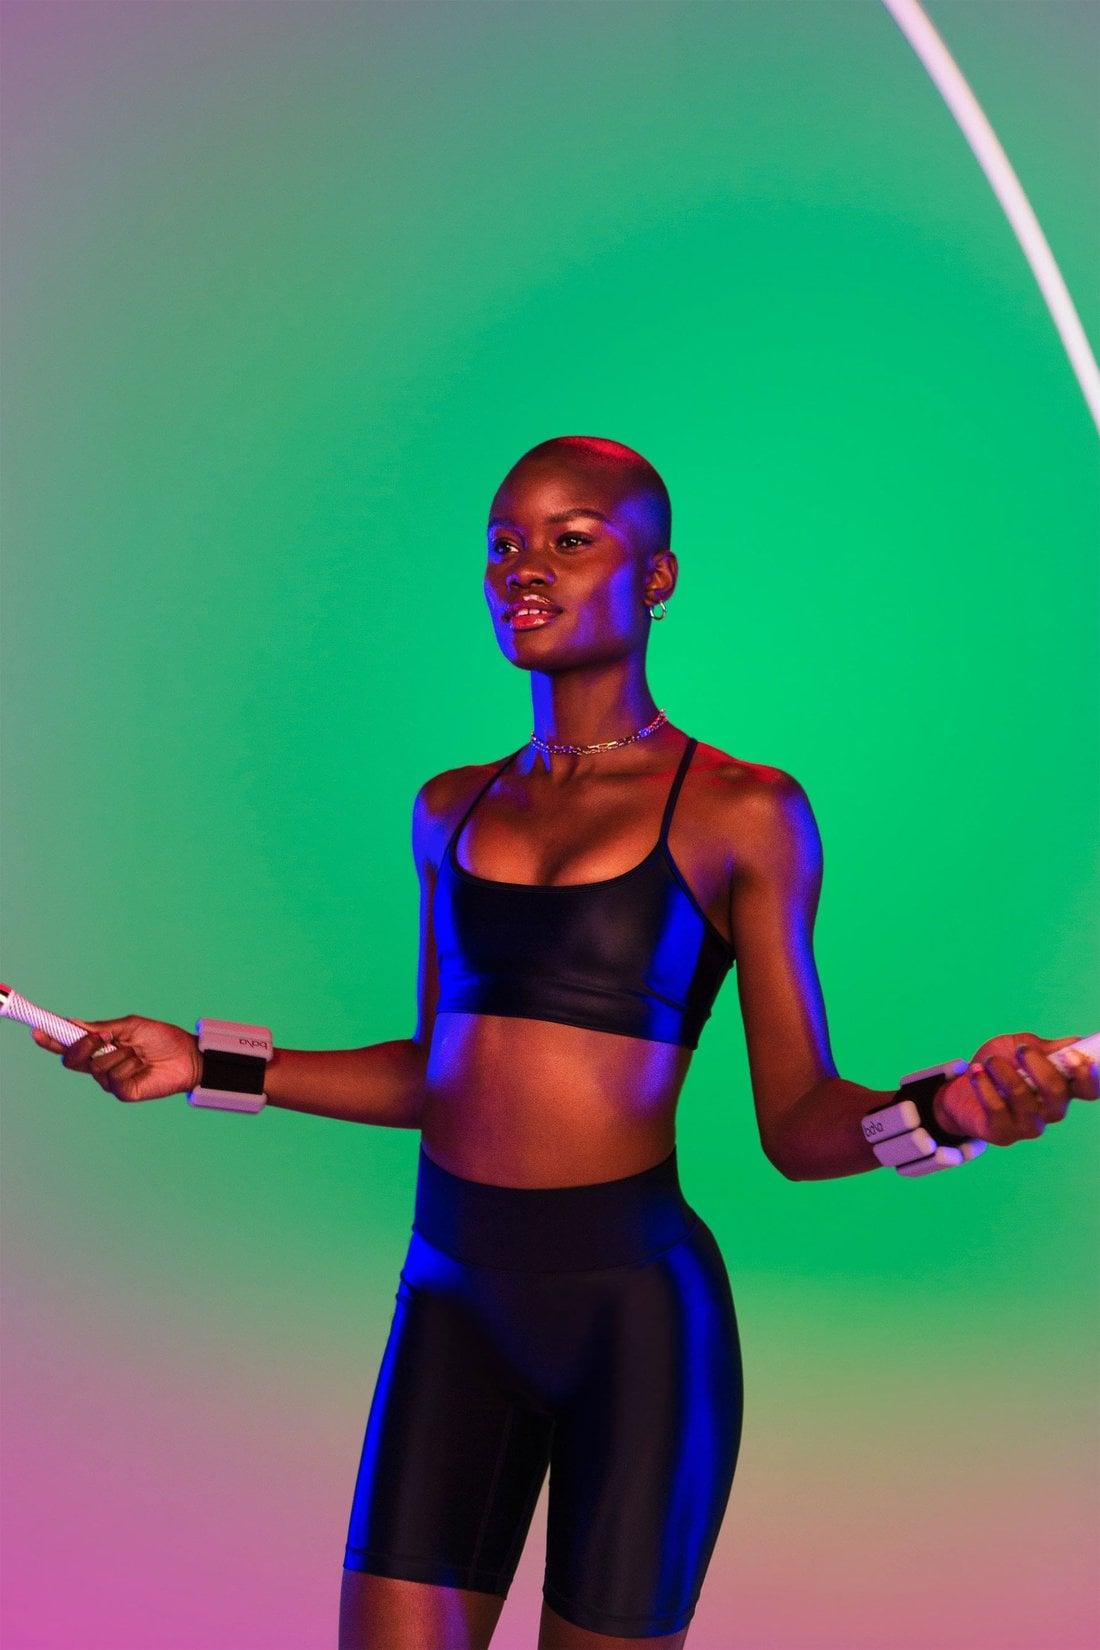 The Cutest Matching Workout Sets | POPSUGAR Fitness